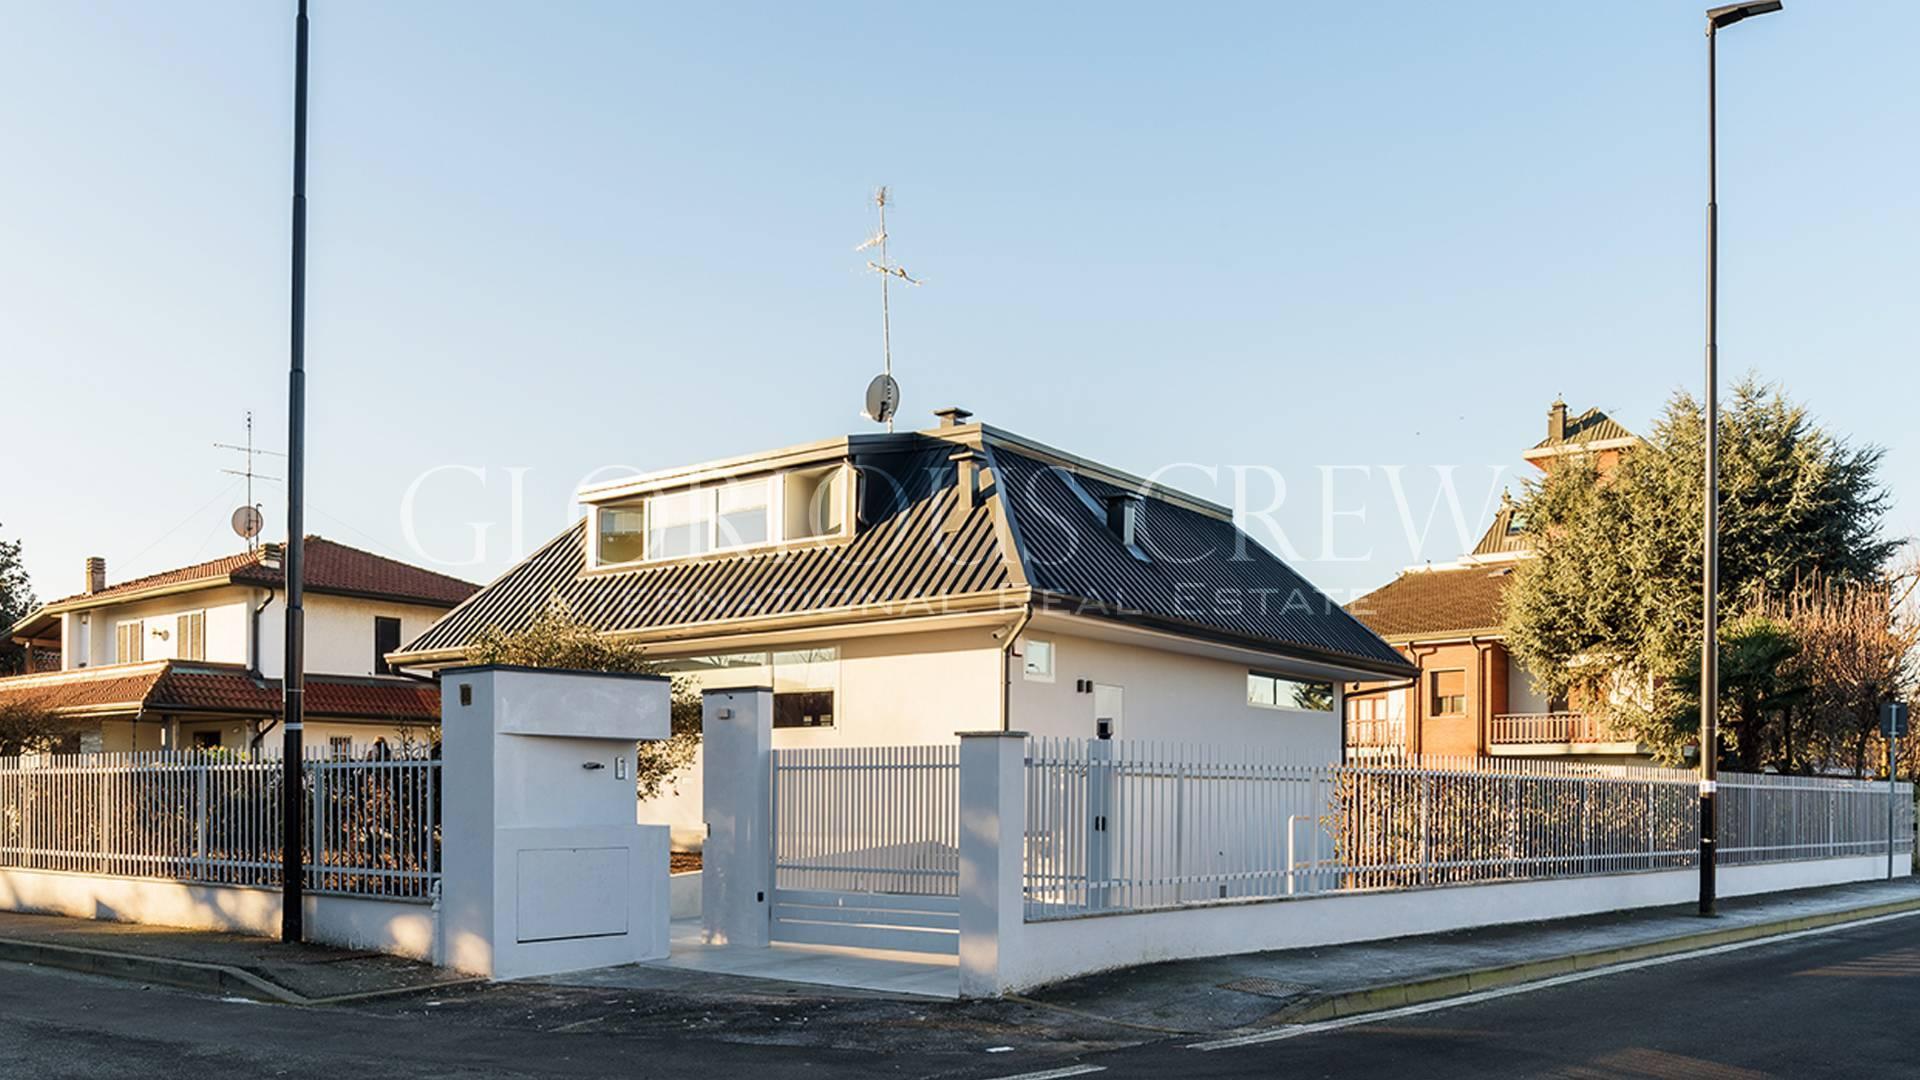 Villa in Vendita a Segrate: 5 locali, 300 mq - Foto 1